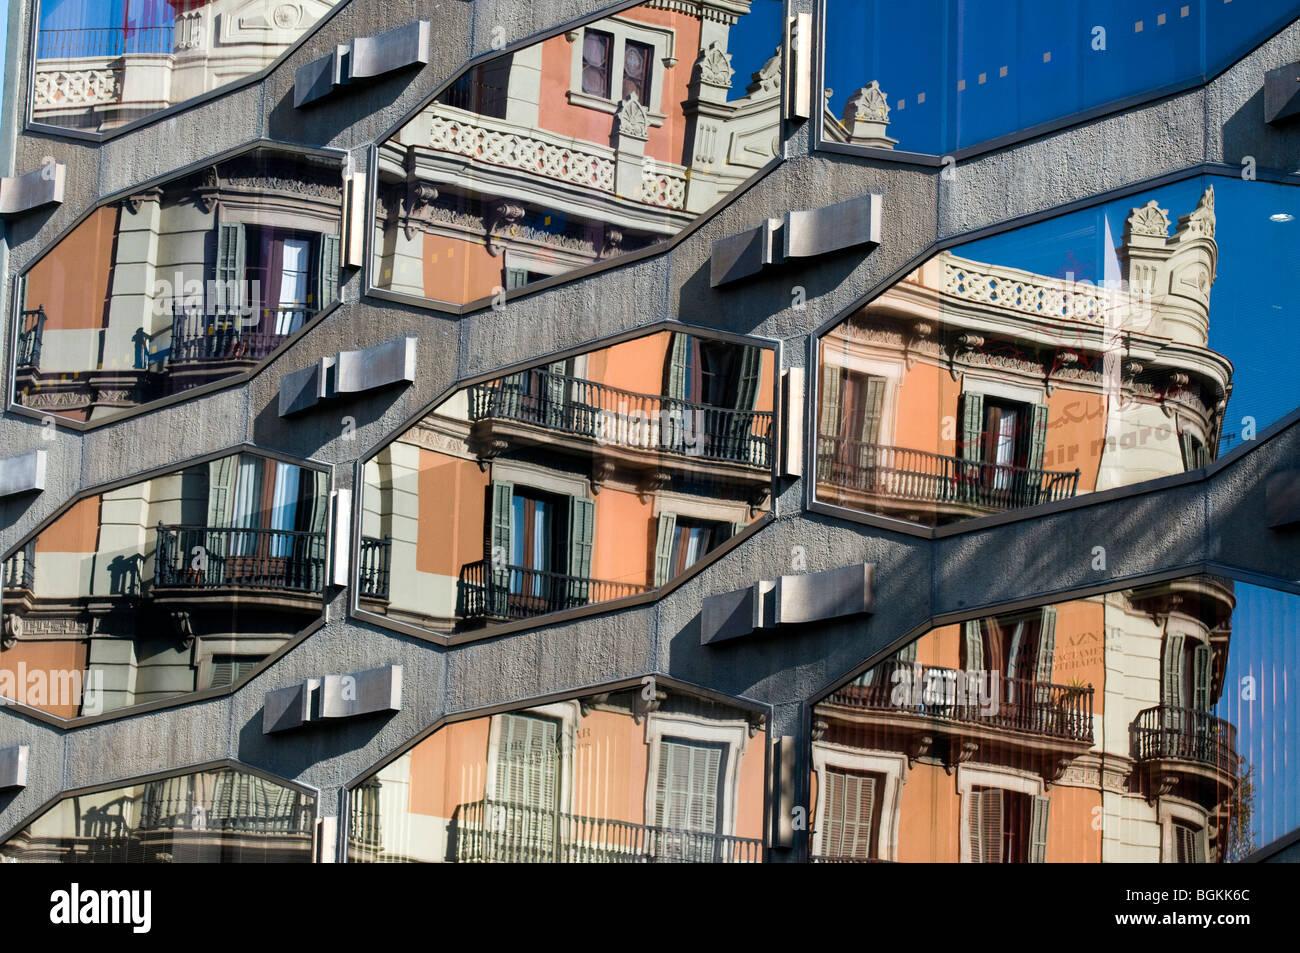 New and old buildings' reflection in Plaça de Urquinaona, Barcelona, Catalunya, Spain Stock Photo